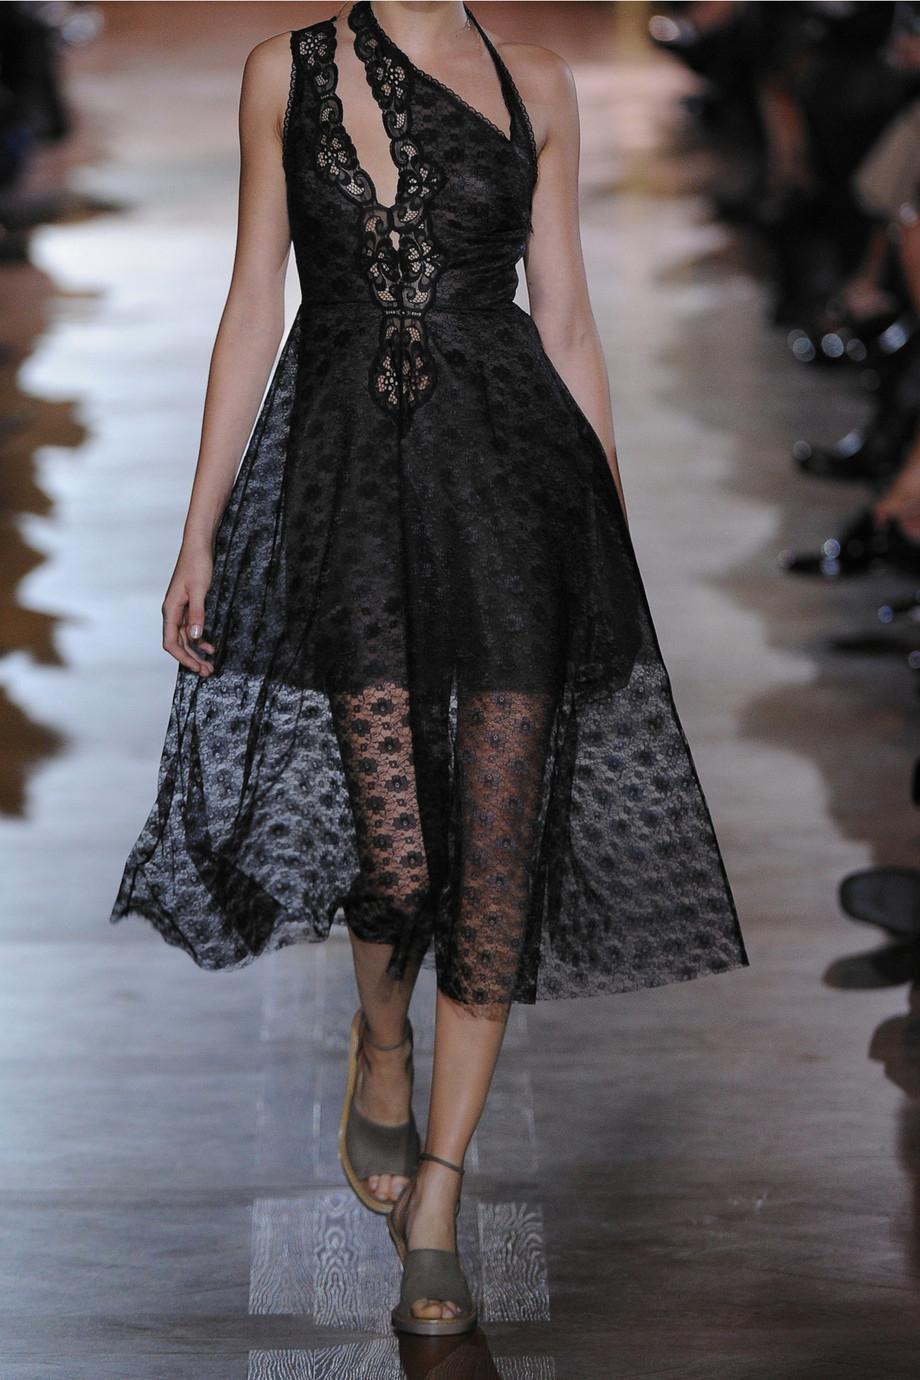 Lyst - Stella Mccartney Caroline Cutout Lace Dress in Black